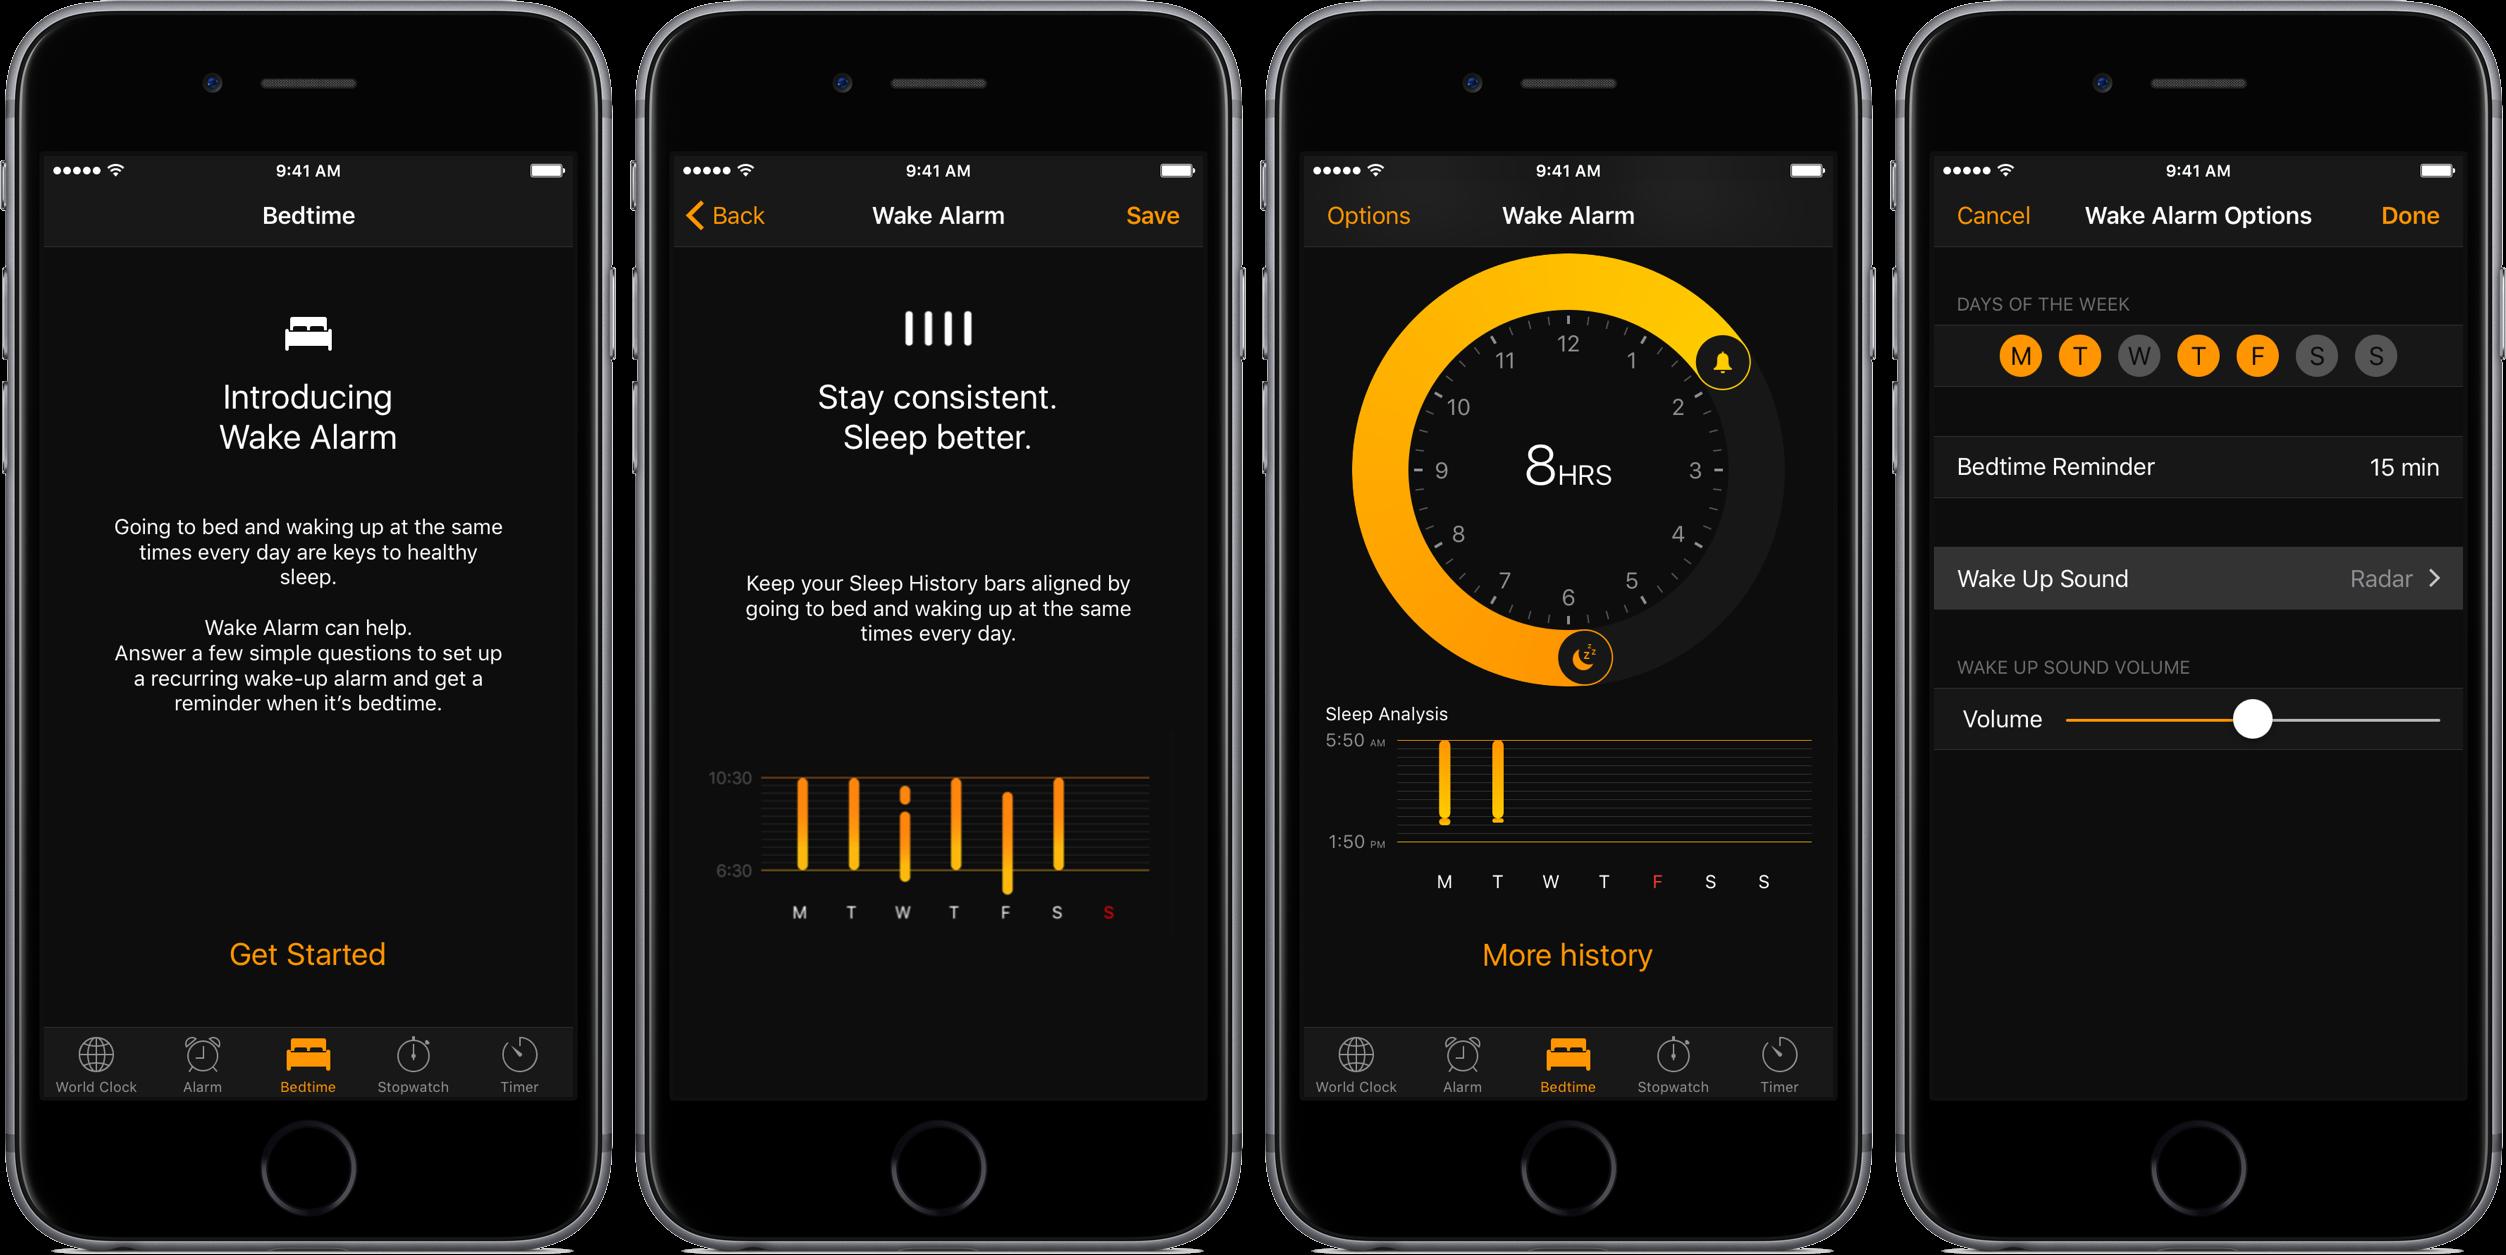 Ios 10 Bedtime Alarm Teaser 001 Space Gray Iphone Screenshot Iphone Clock Good Sleep New Ios